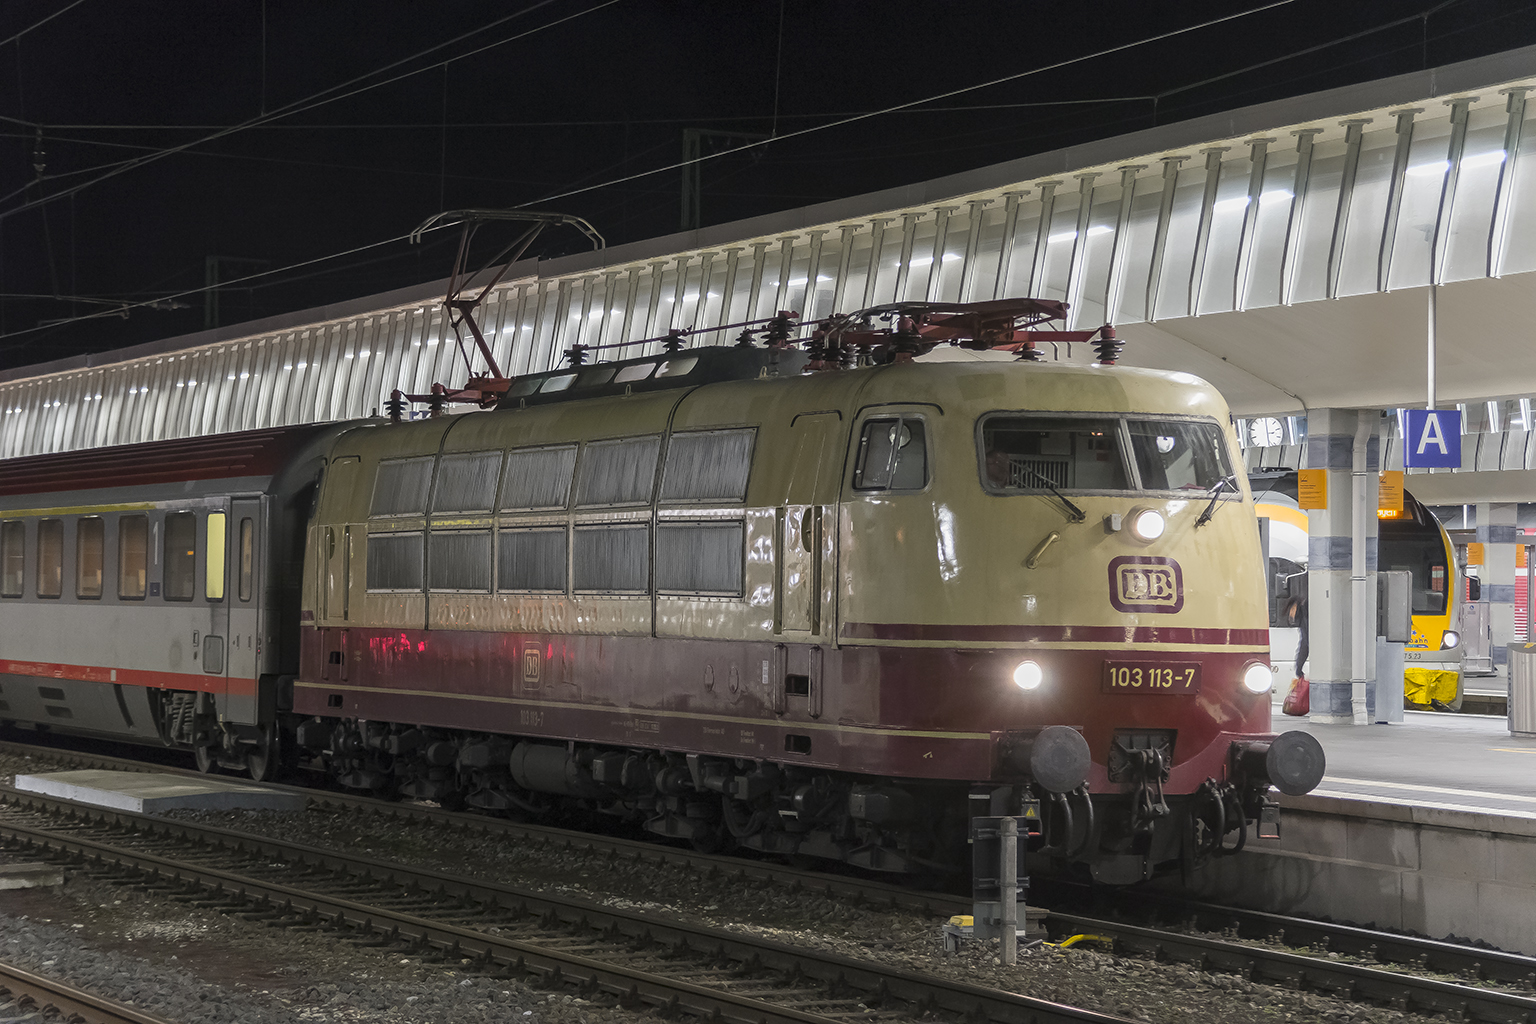 103 113 Münster 30122013 dvd0028 72